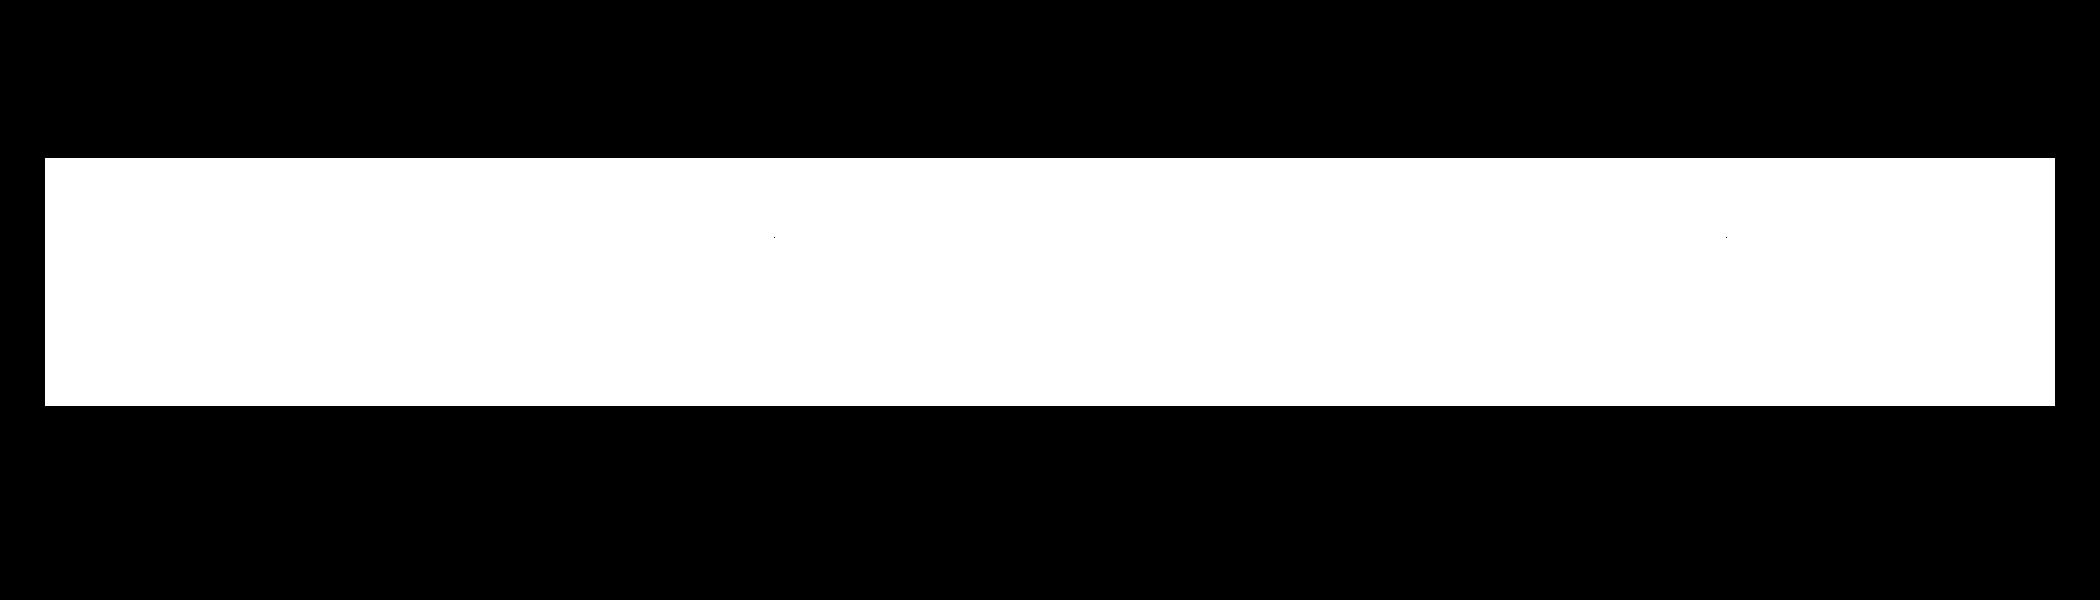 2020.02.11 Stage 2 Logo - White - Final